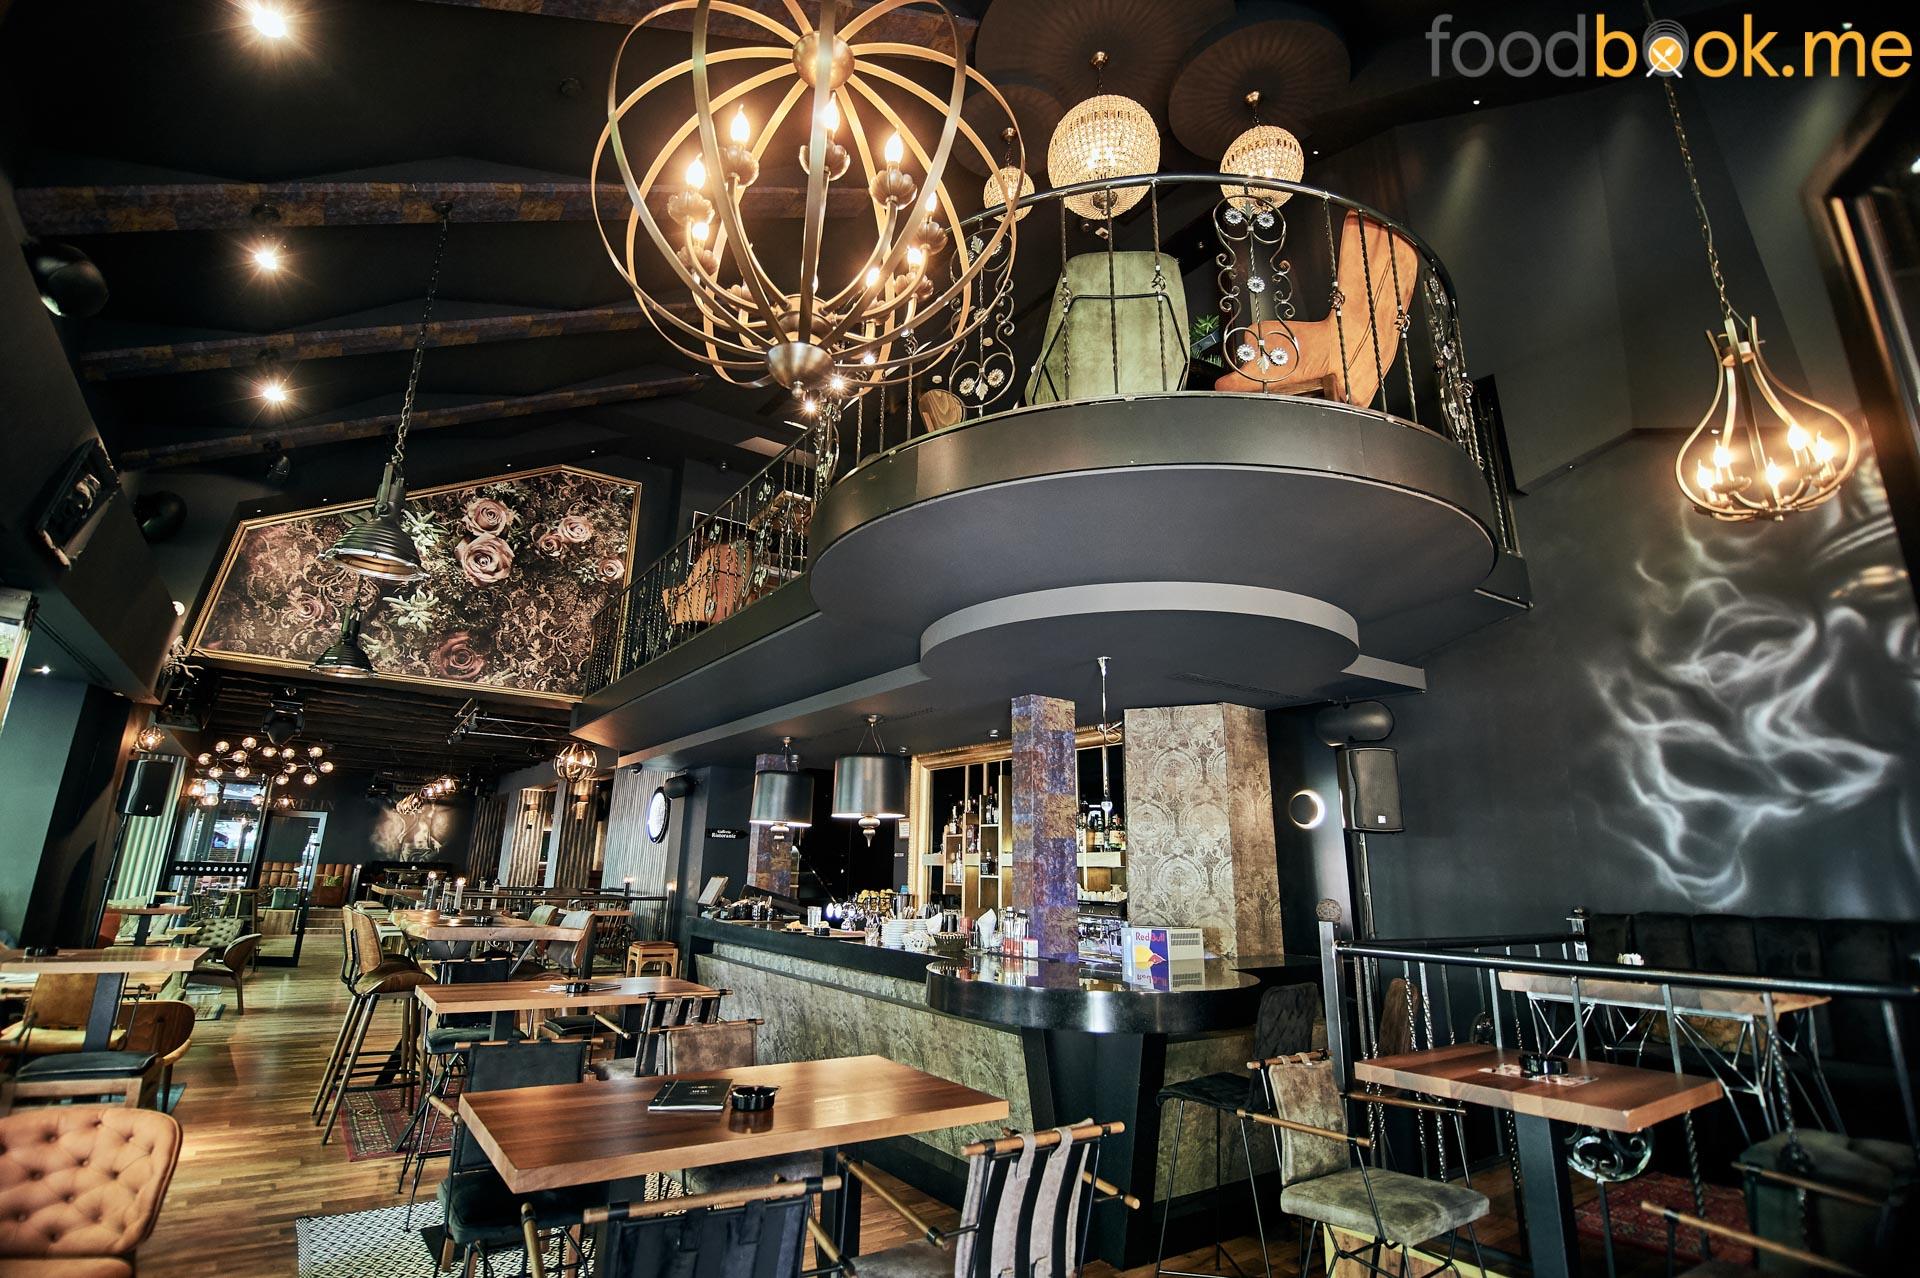 Zeppelin Lounge bar cover photo